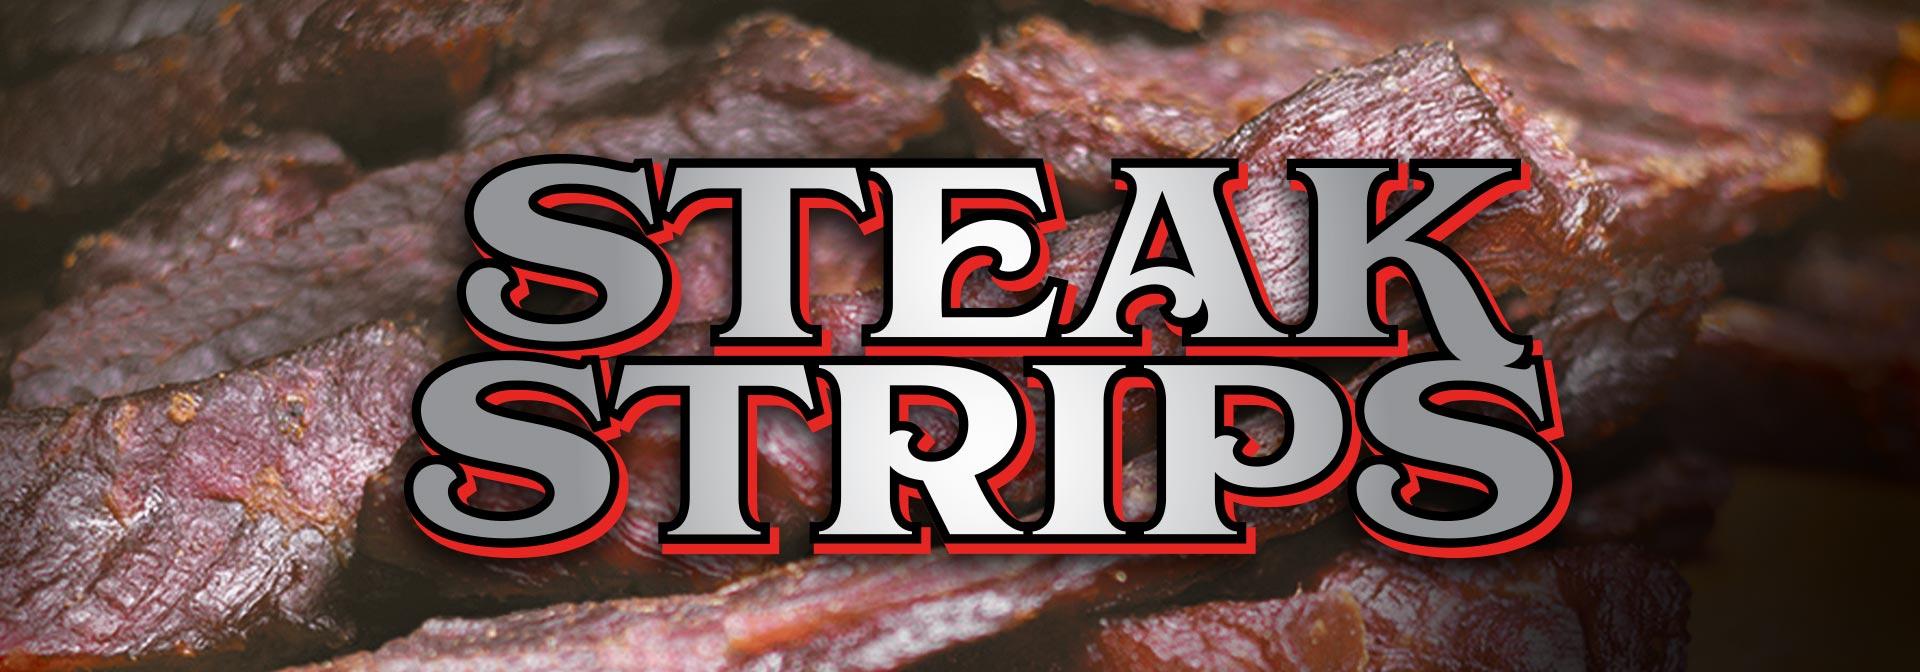 Jack Links Johnny Morris Steak Strips